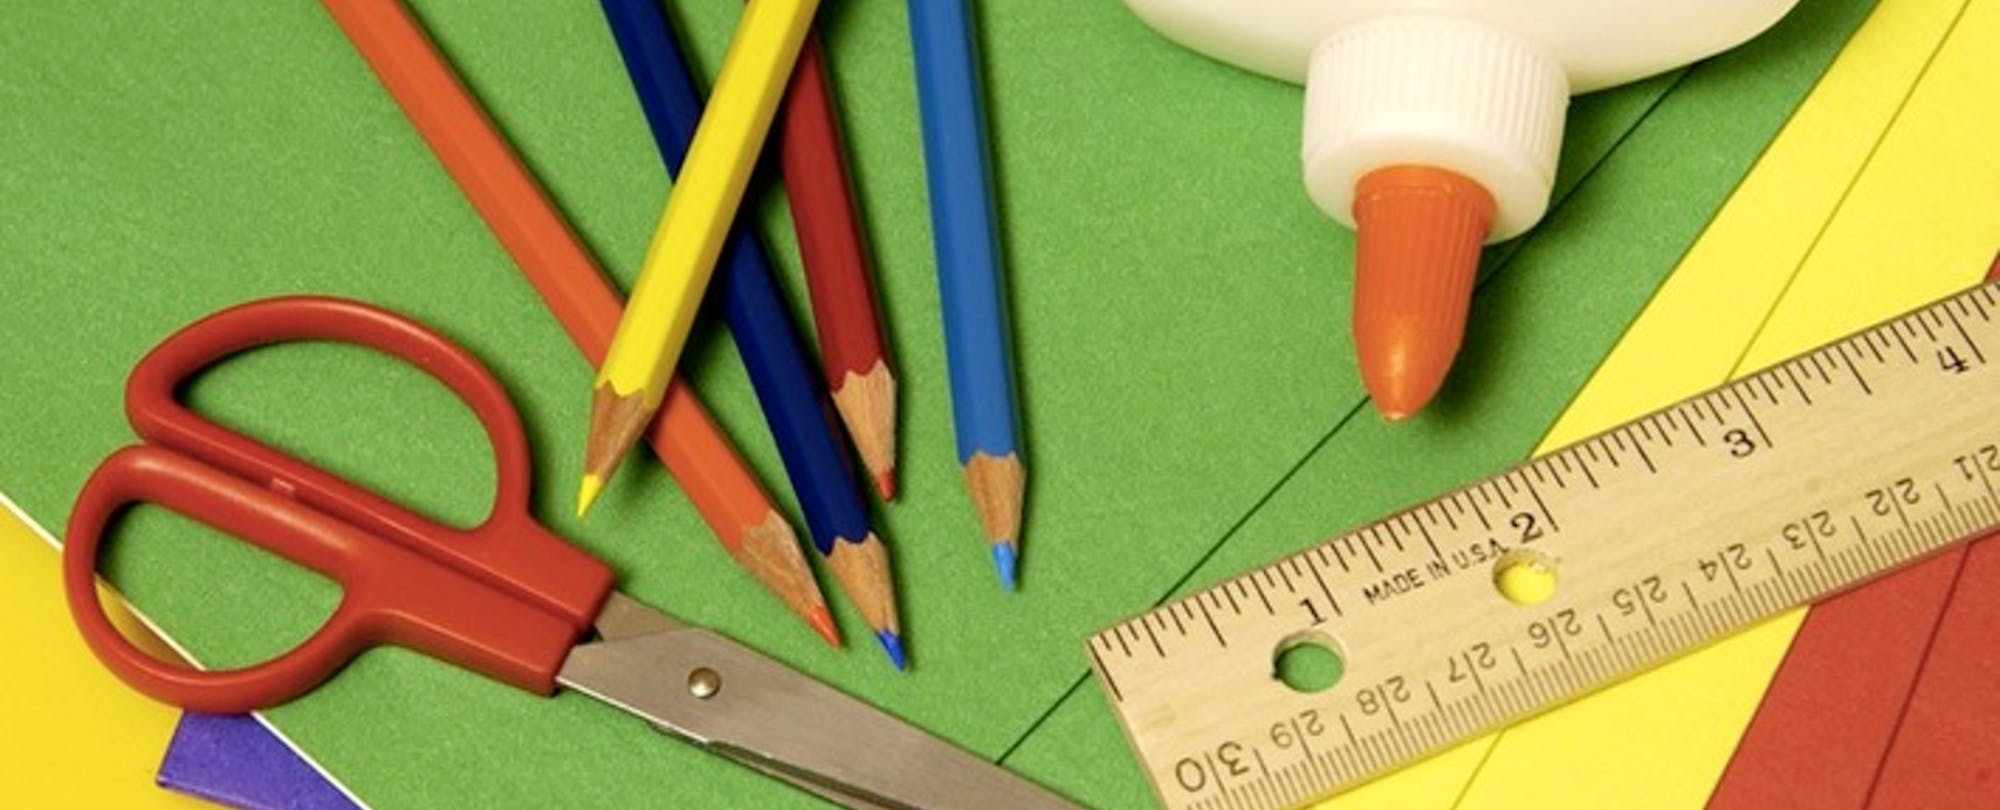 Gates Foundation to Help Fill Teachers' Supplies Wish Lists